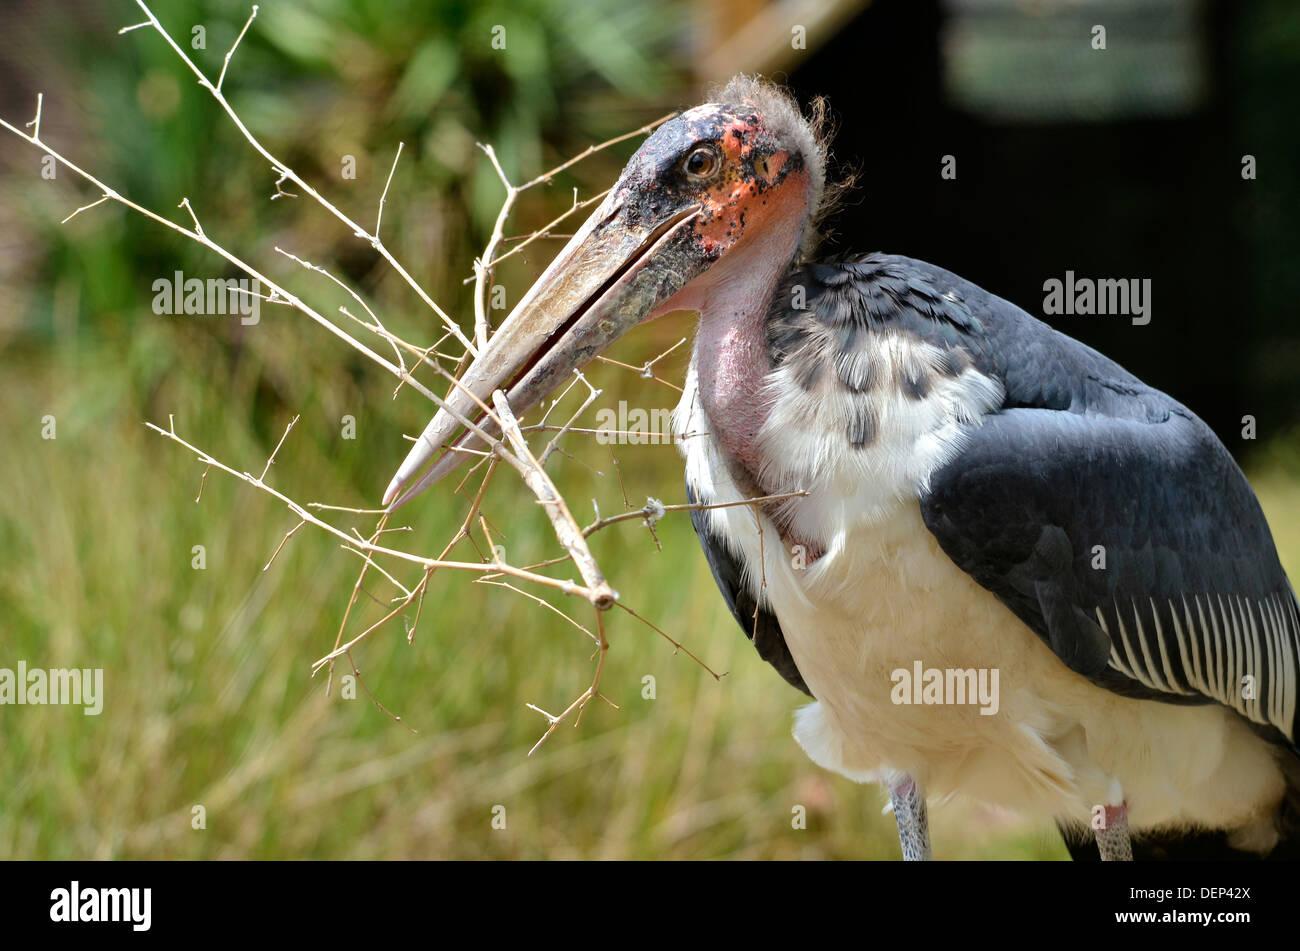 Closeup of a marabou (Leptoptilos crumeniferus) holding a twig in its beak - Stock Image